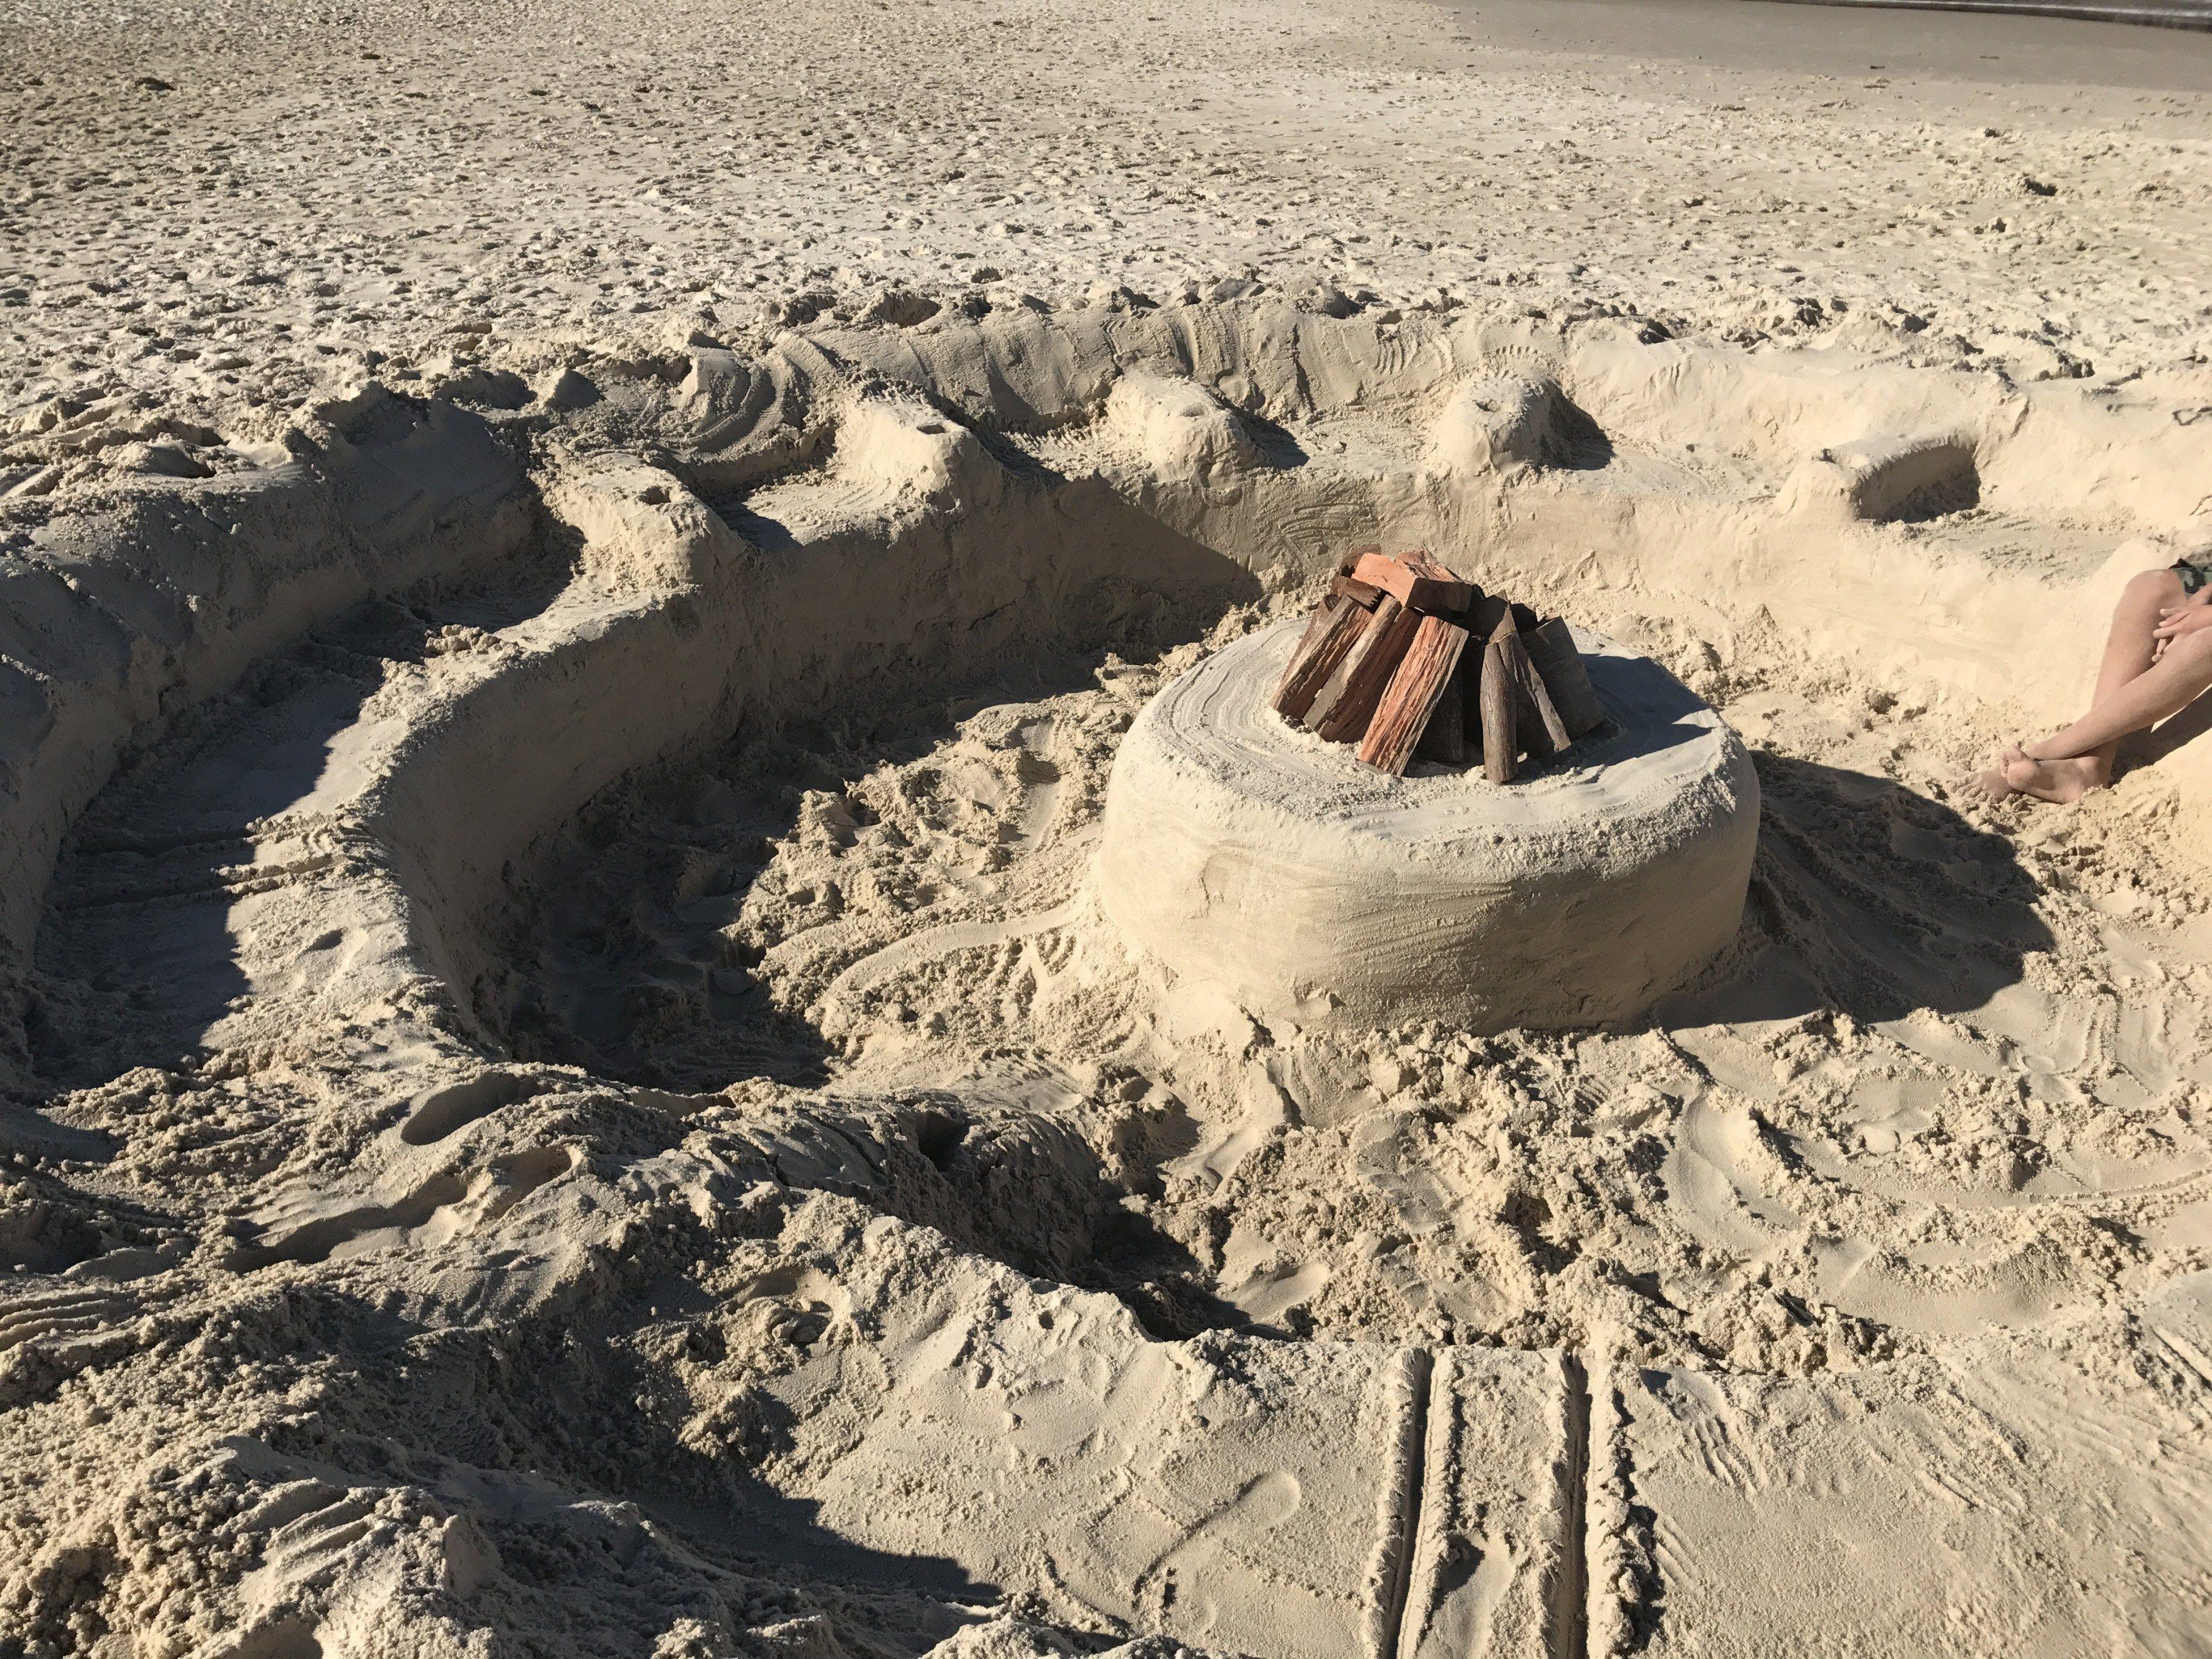 Good Night Sand fire pits, Big family, Summertime fun